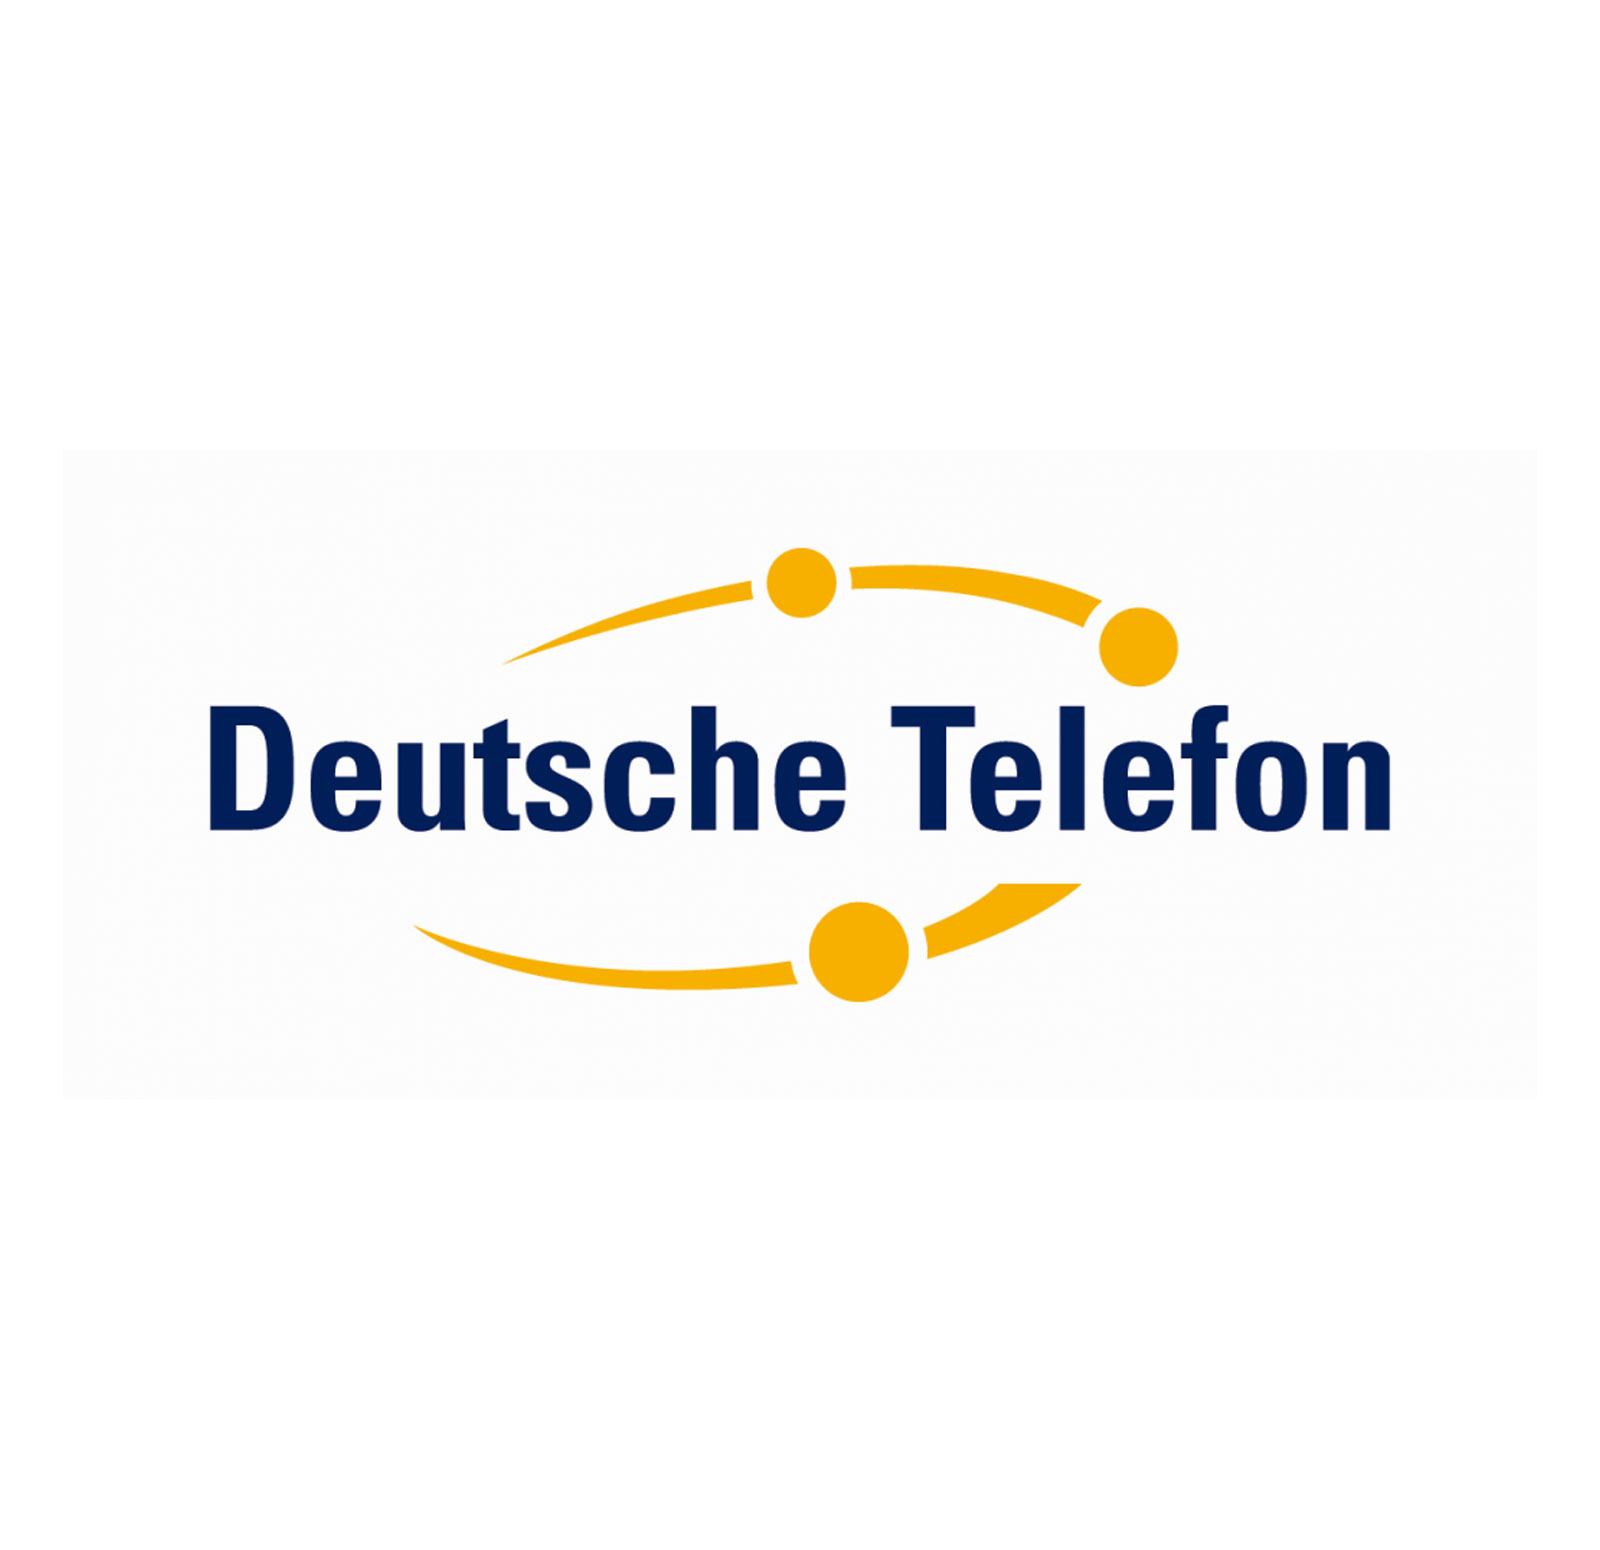 deutschetelefon